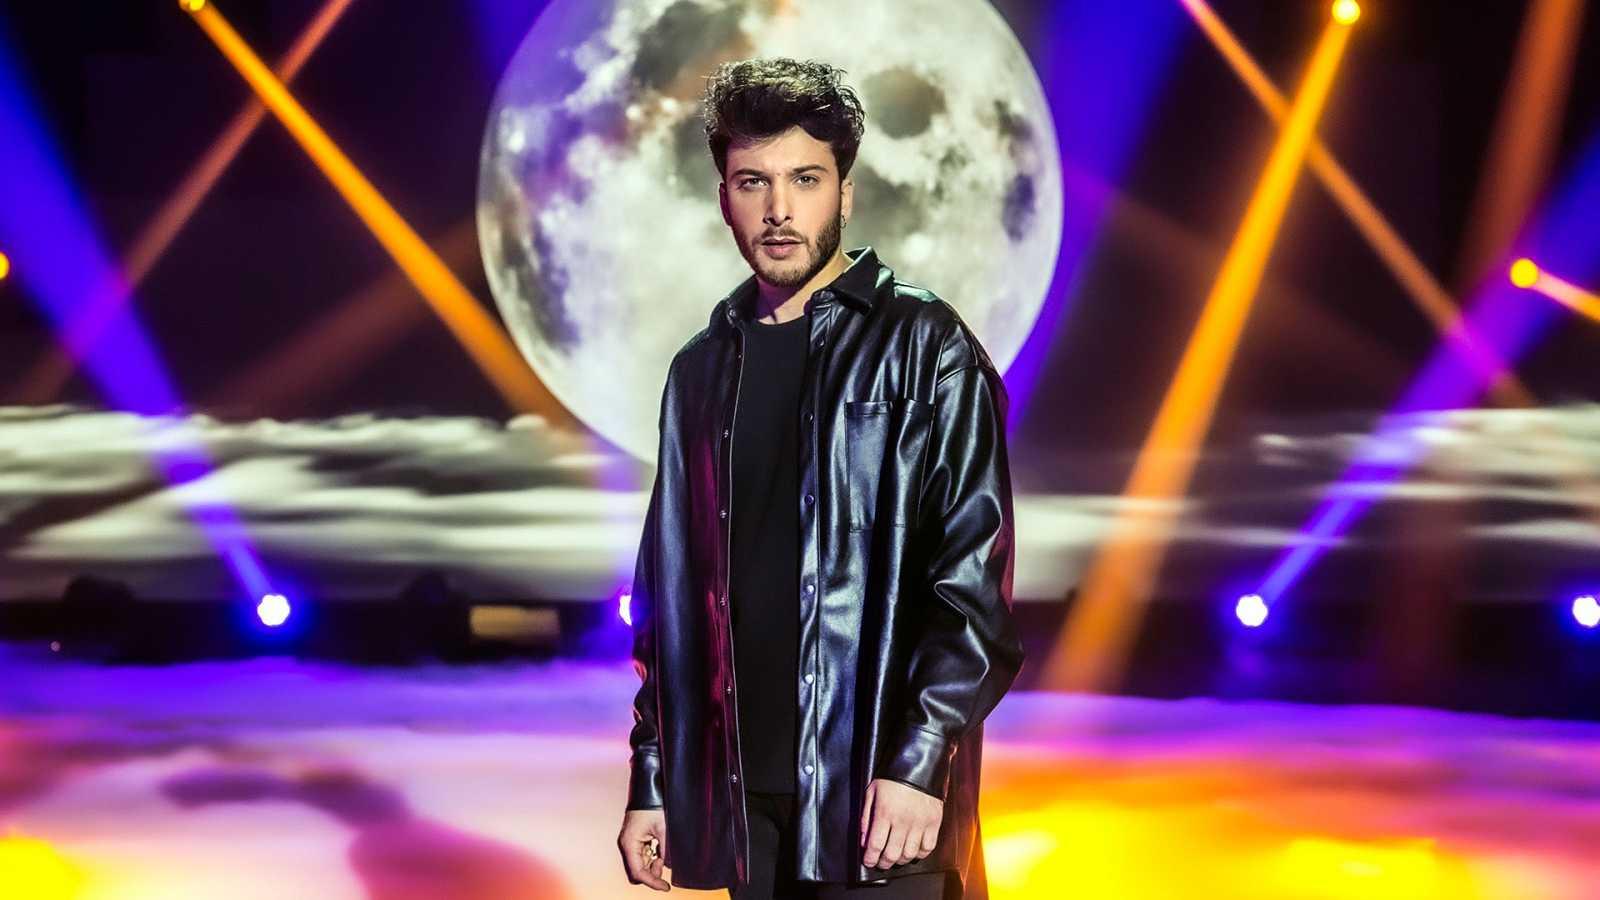 Eurovisión 2021 - Vive la semana de Eurovisión en RTVE